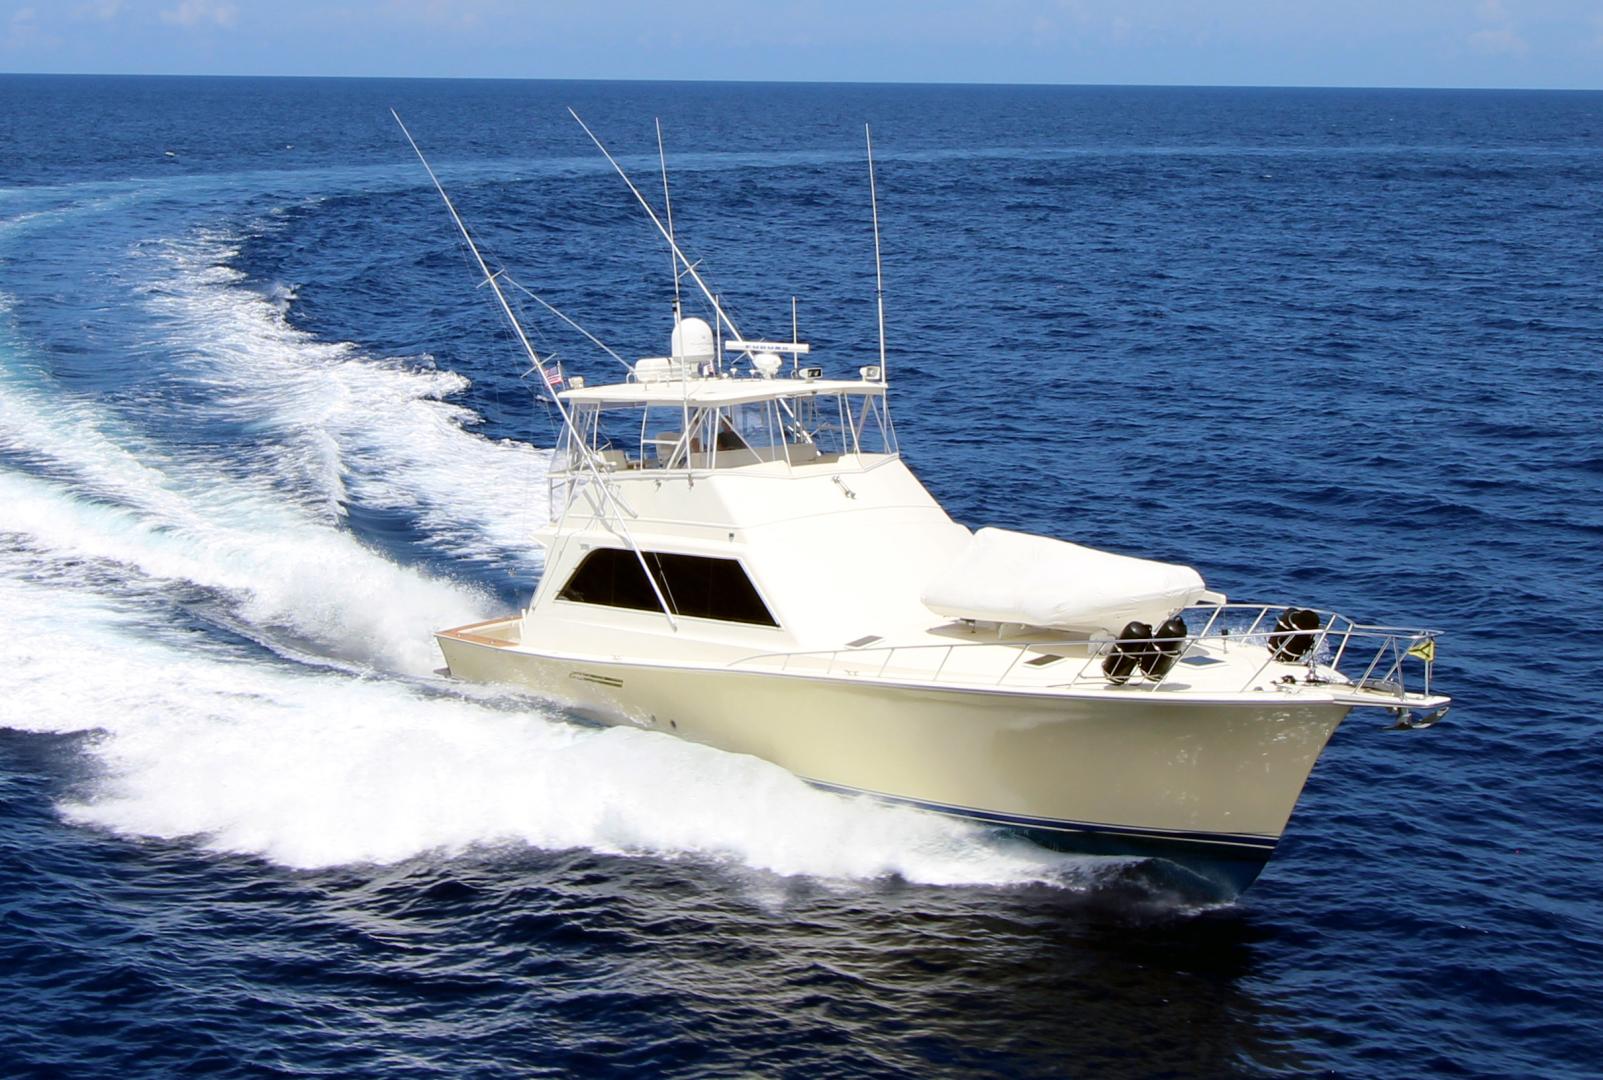 Ocean-Convertible 1989-Coho Ft Lauderdale-Florida-United States-1439835 | Thumbnail